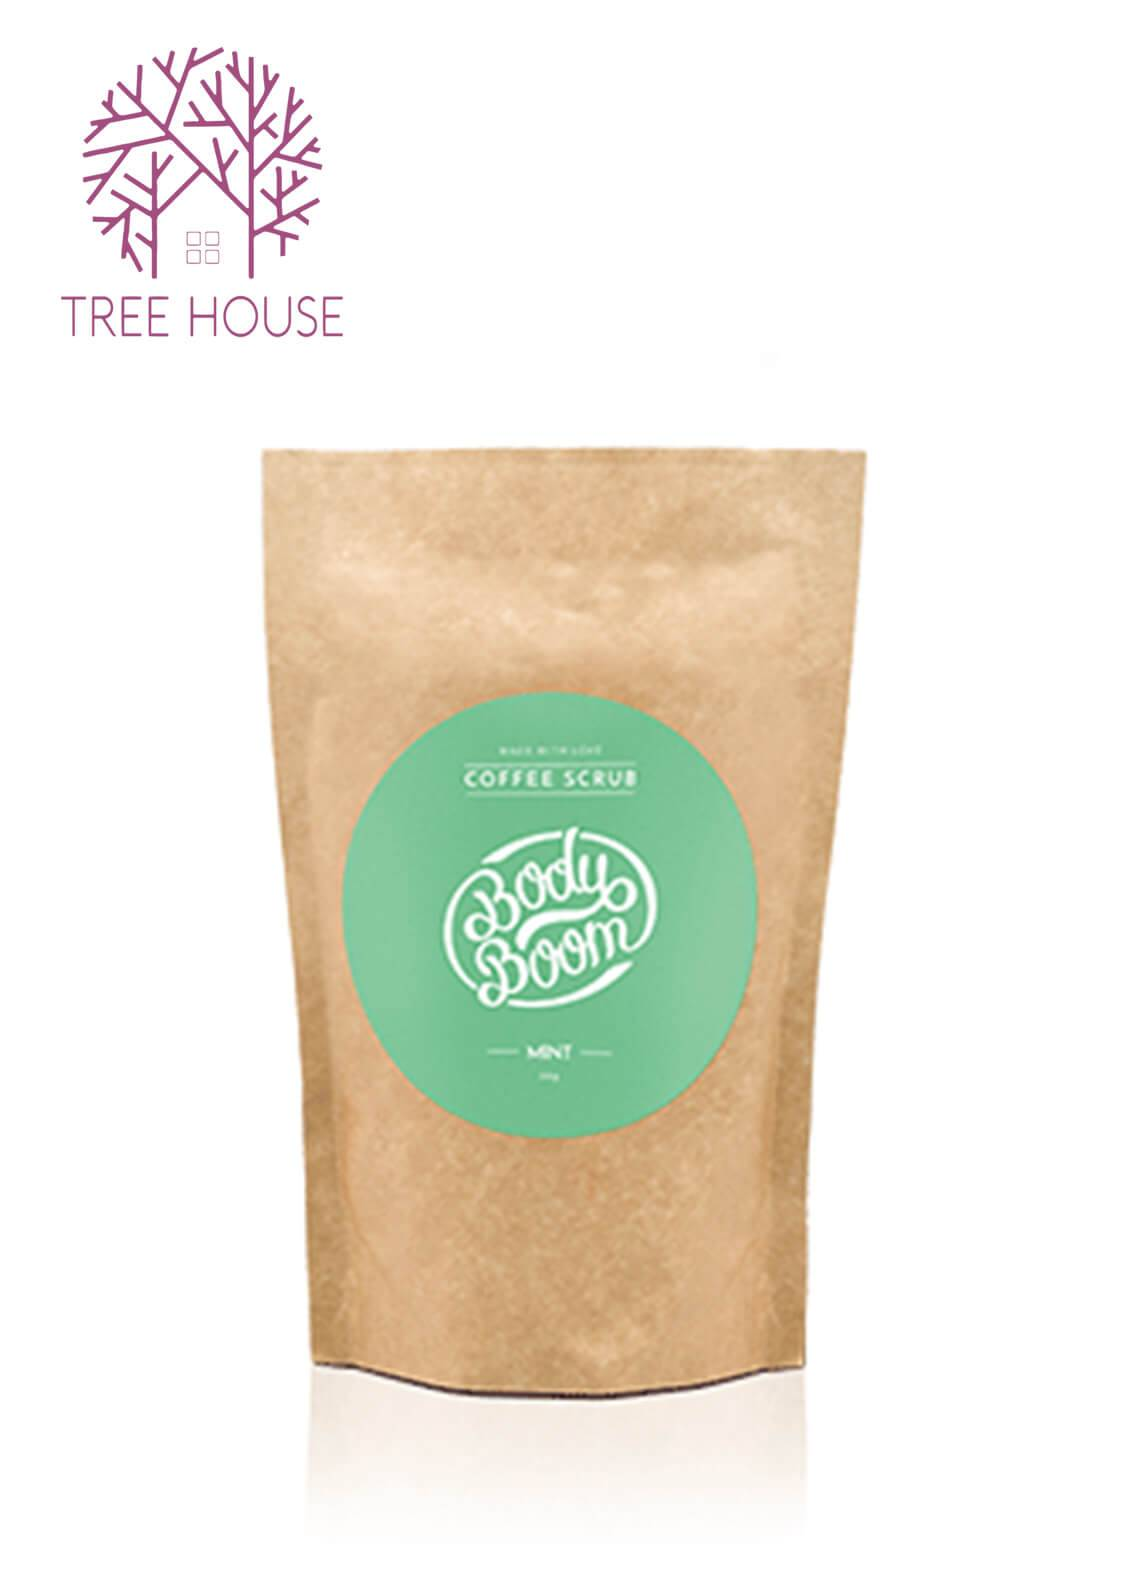 Body Boom Coffee Scrub (Mint Flavour) - 30g